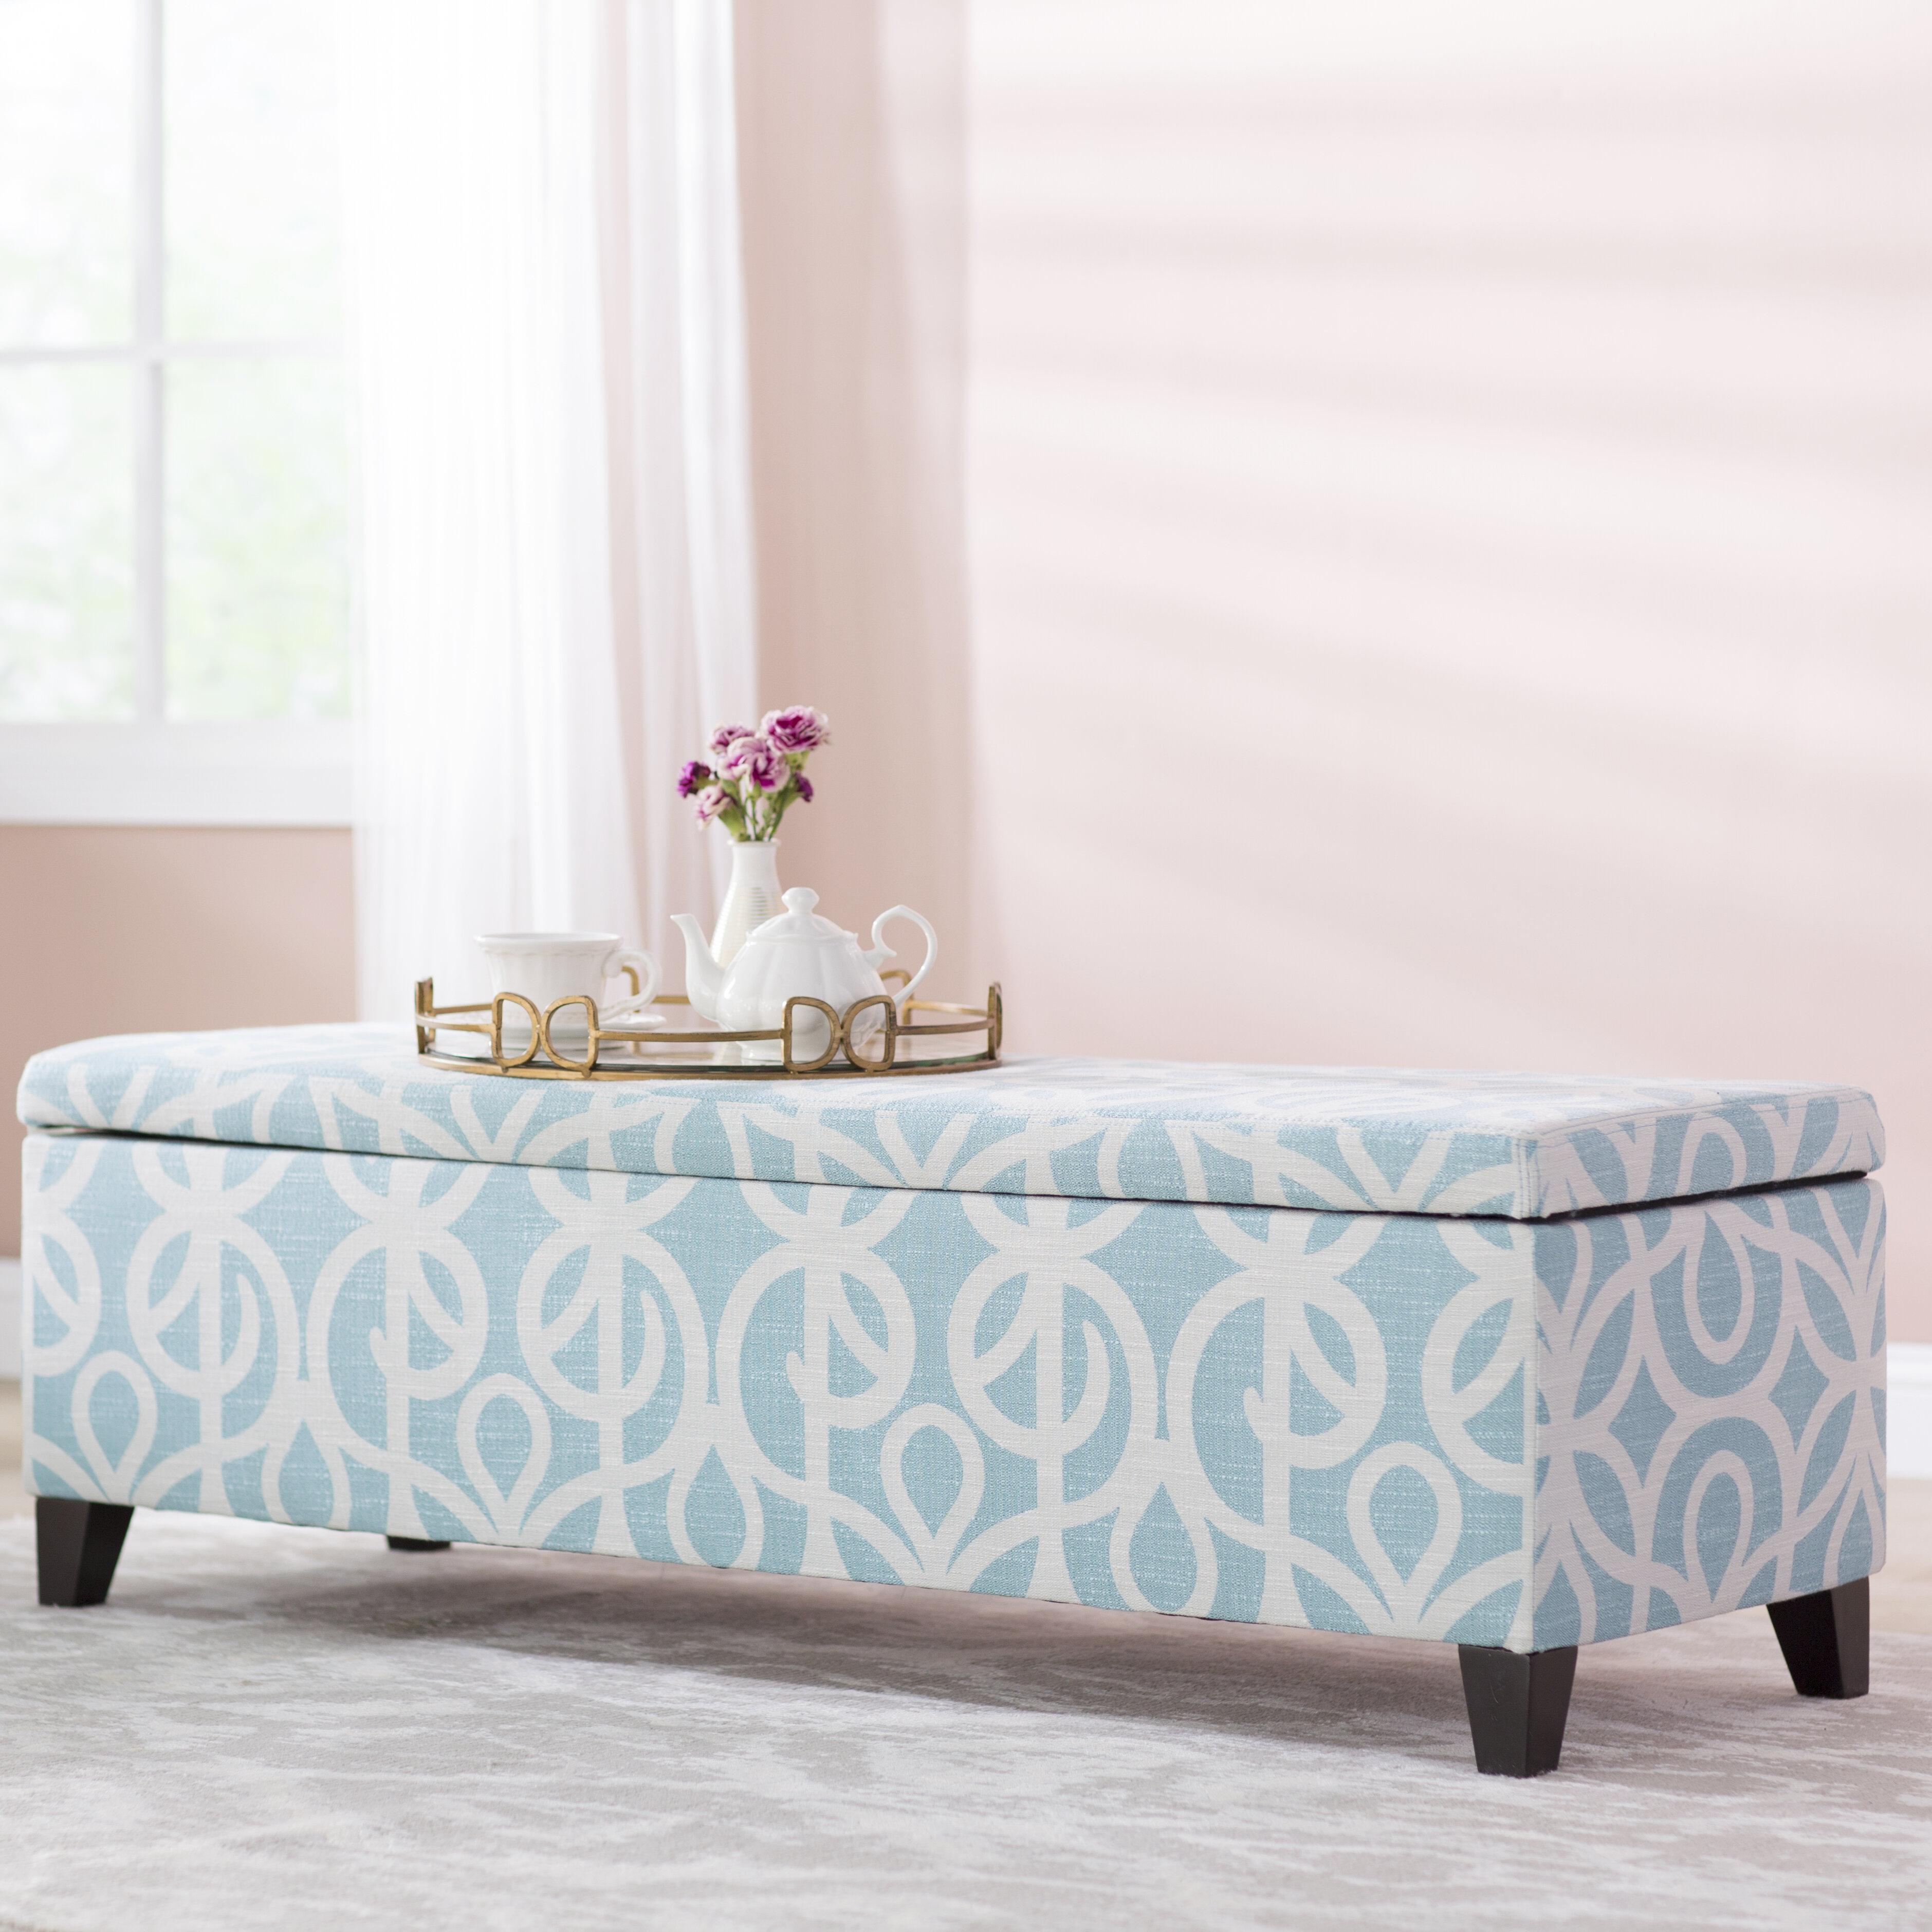 Charlton Home Adair Upholstered Storage Bench U0026 Reviews | Wayfair